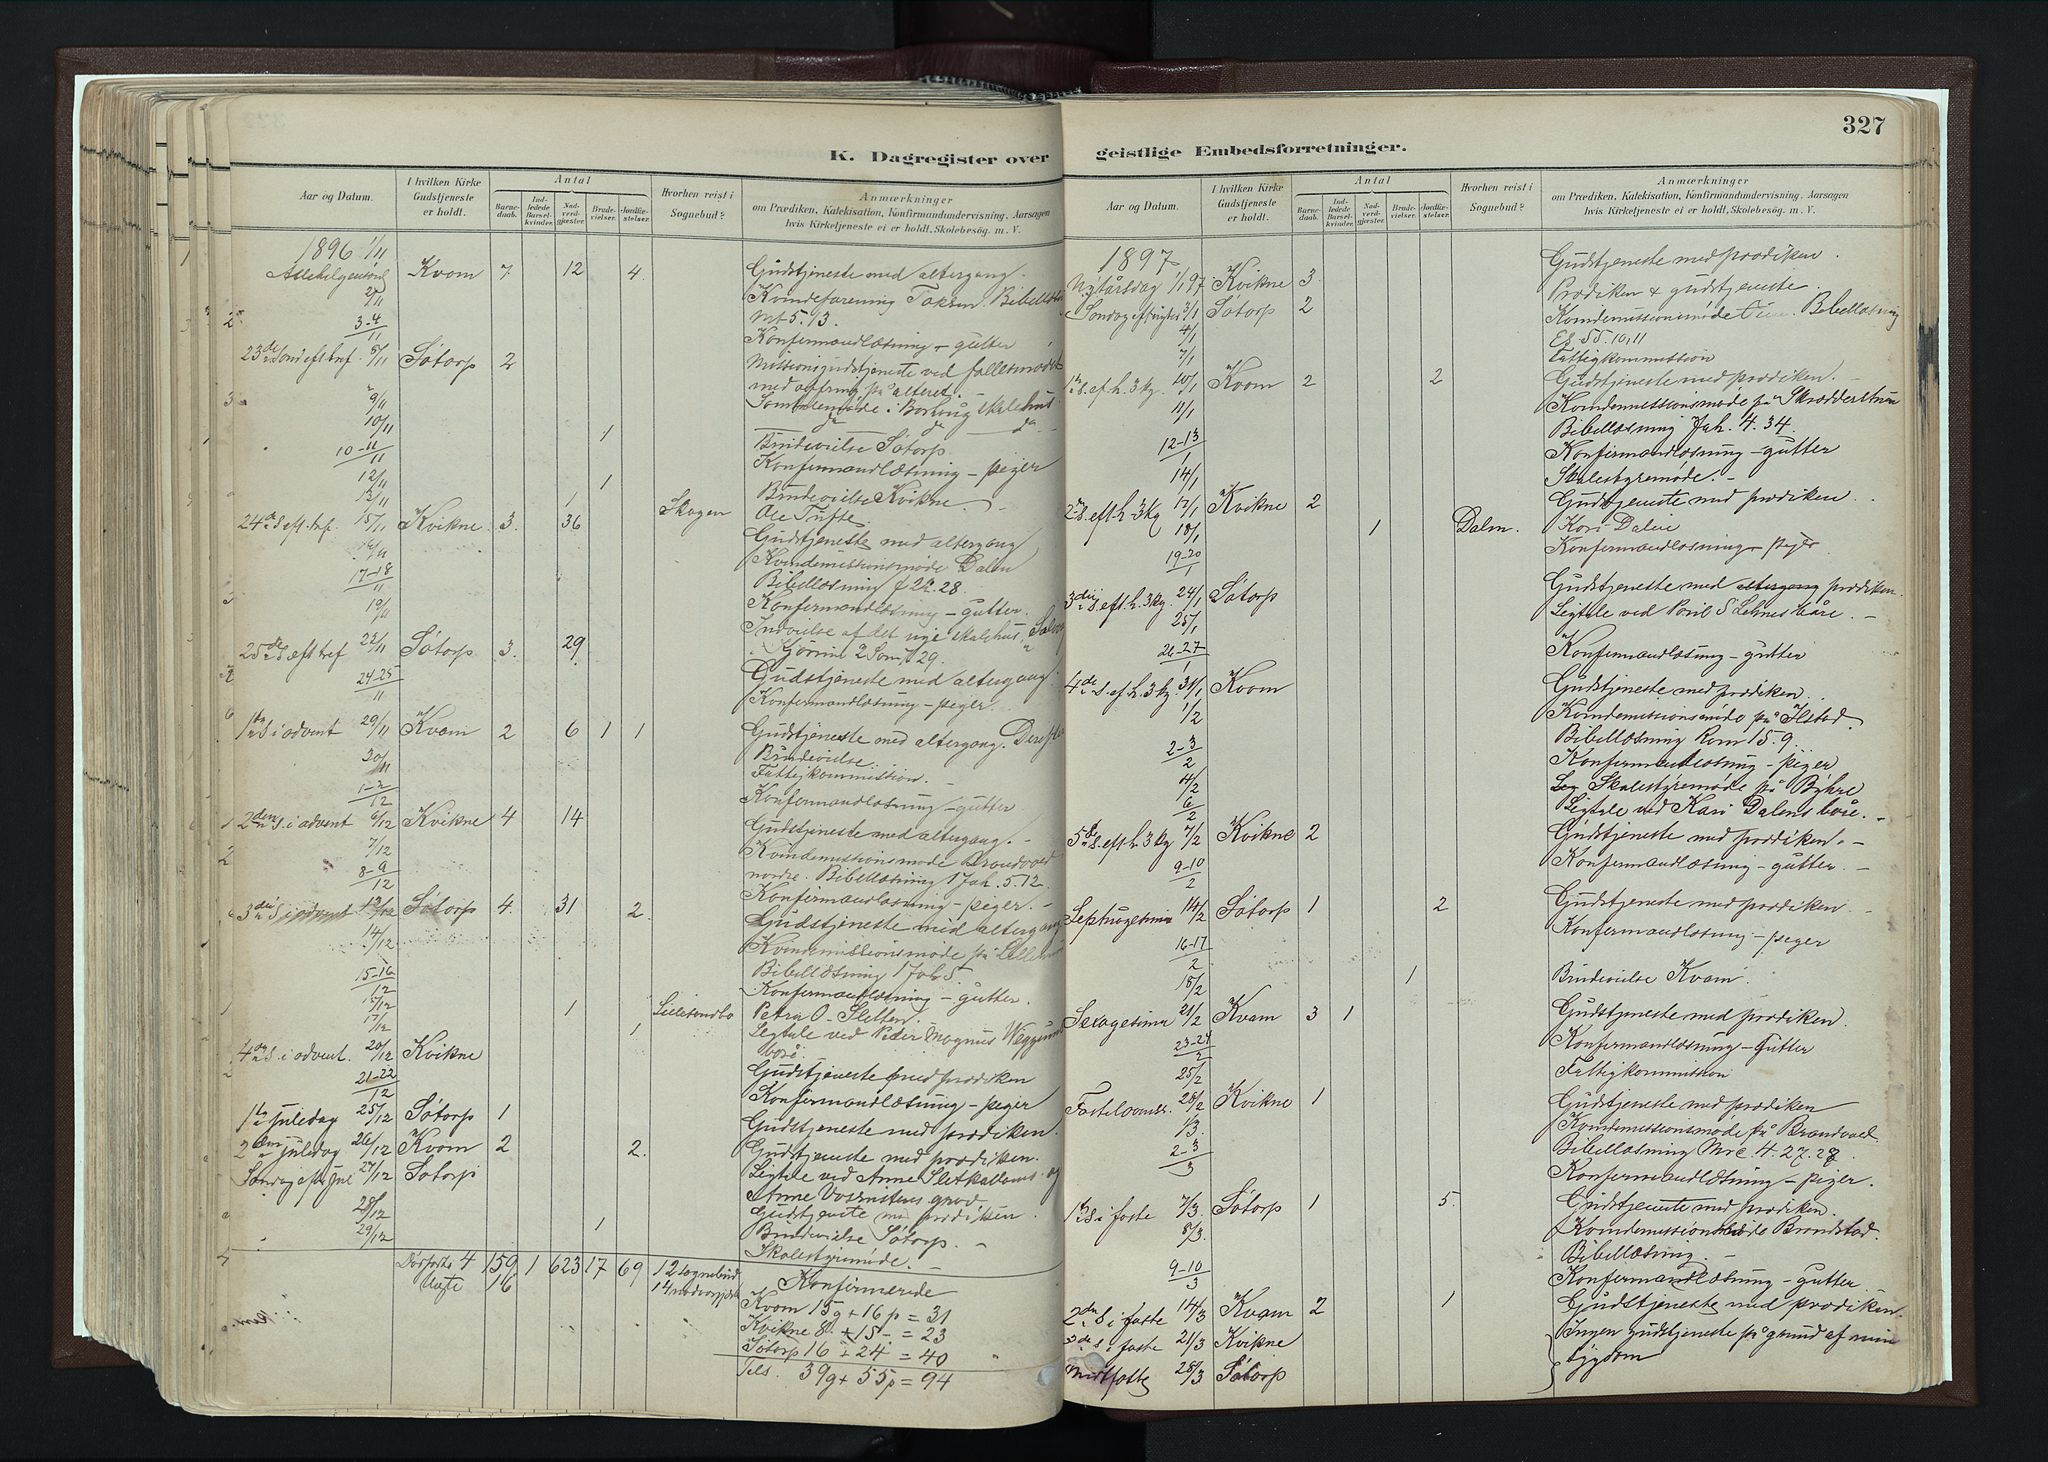 SAH, Nord-Fron prestekontor, Ministerialbok nr. 4, 1884-1914, s. 327